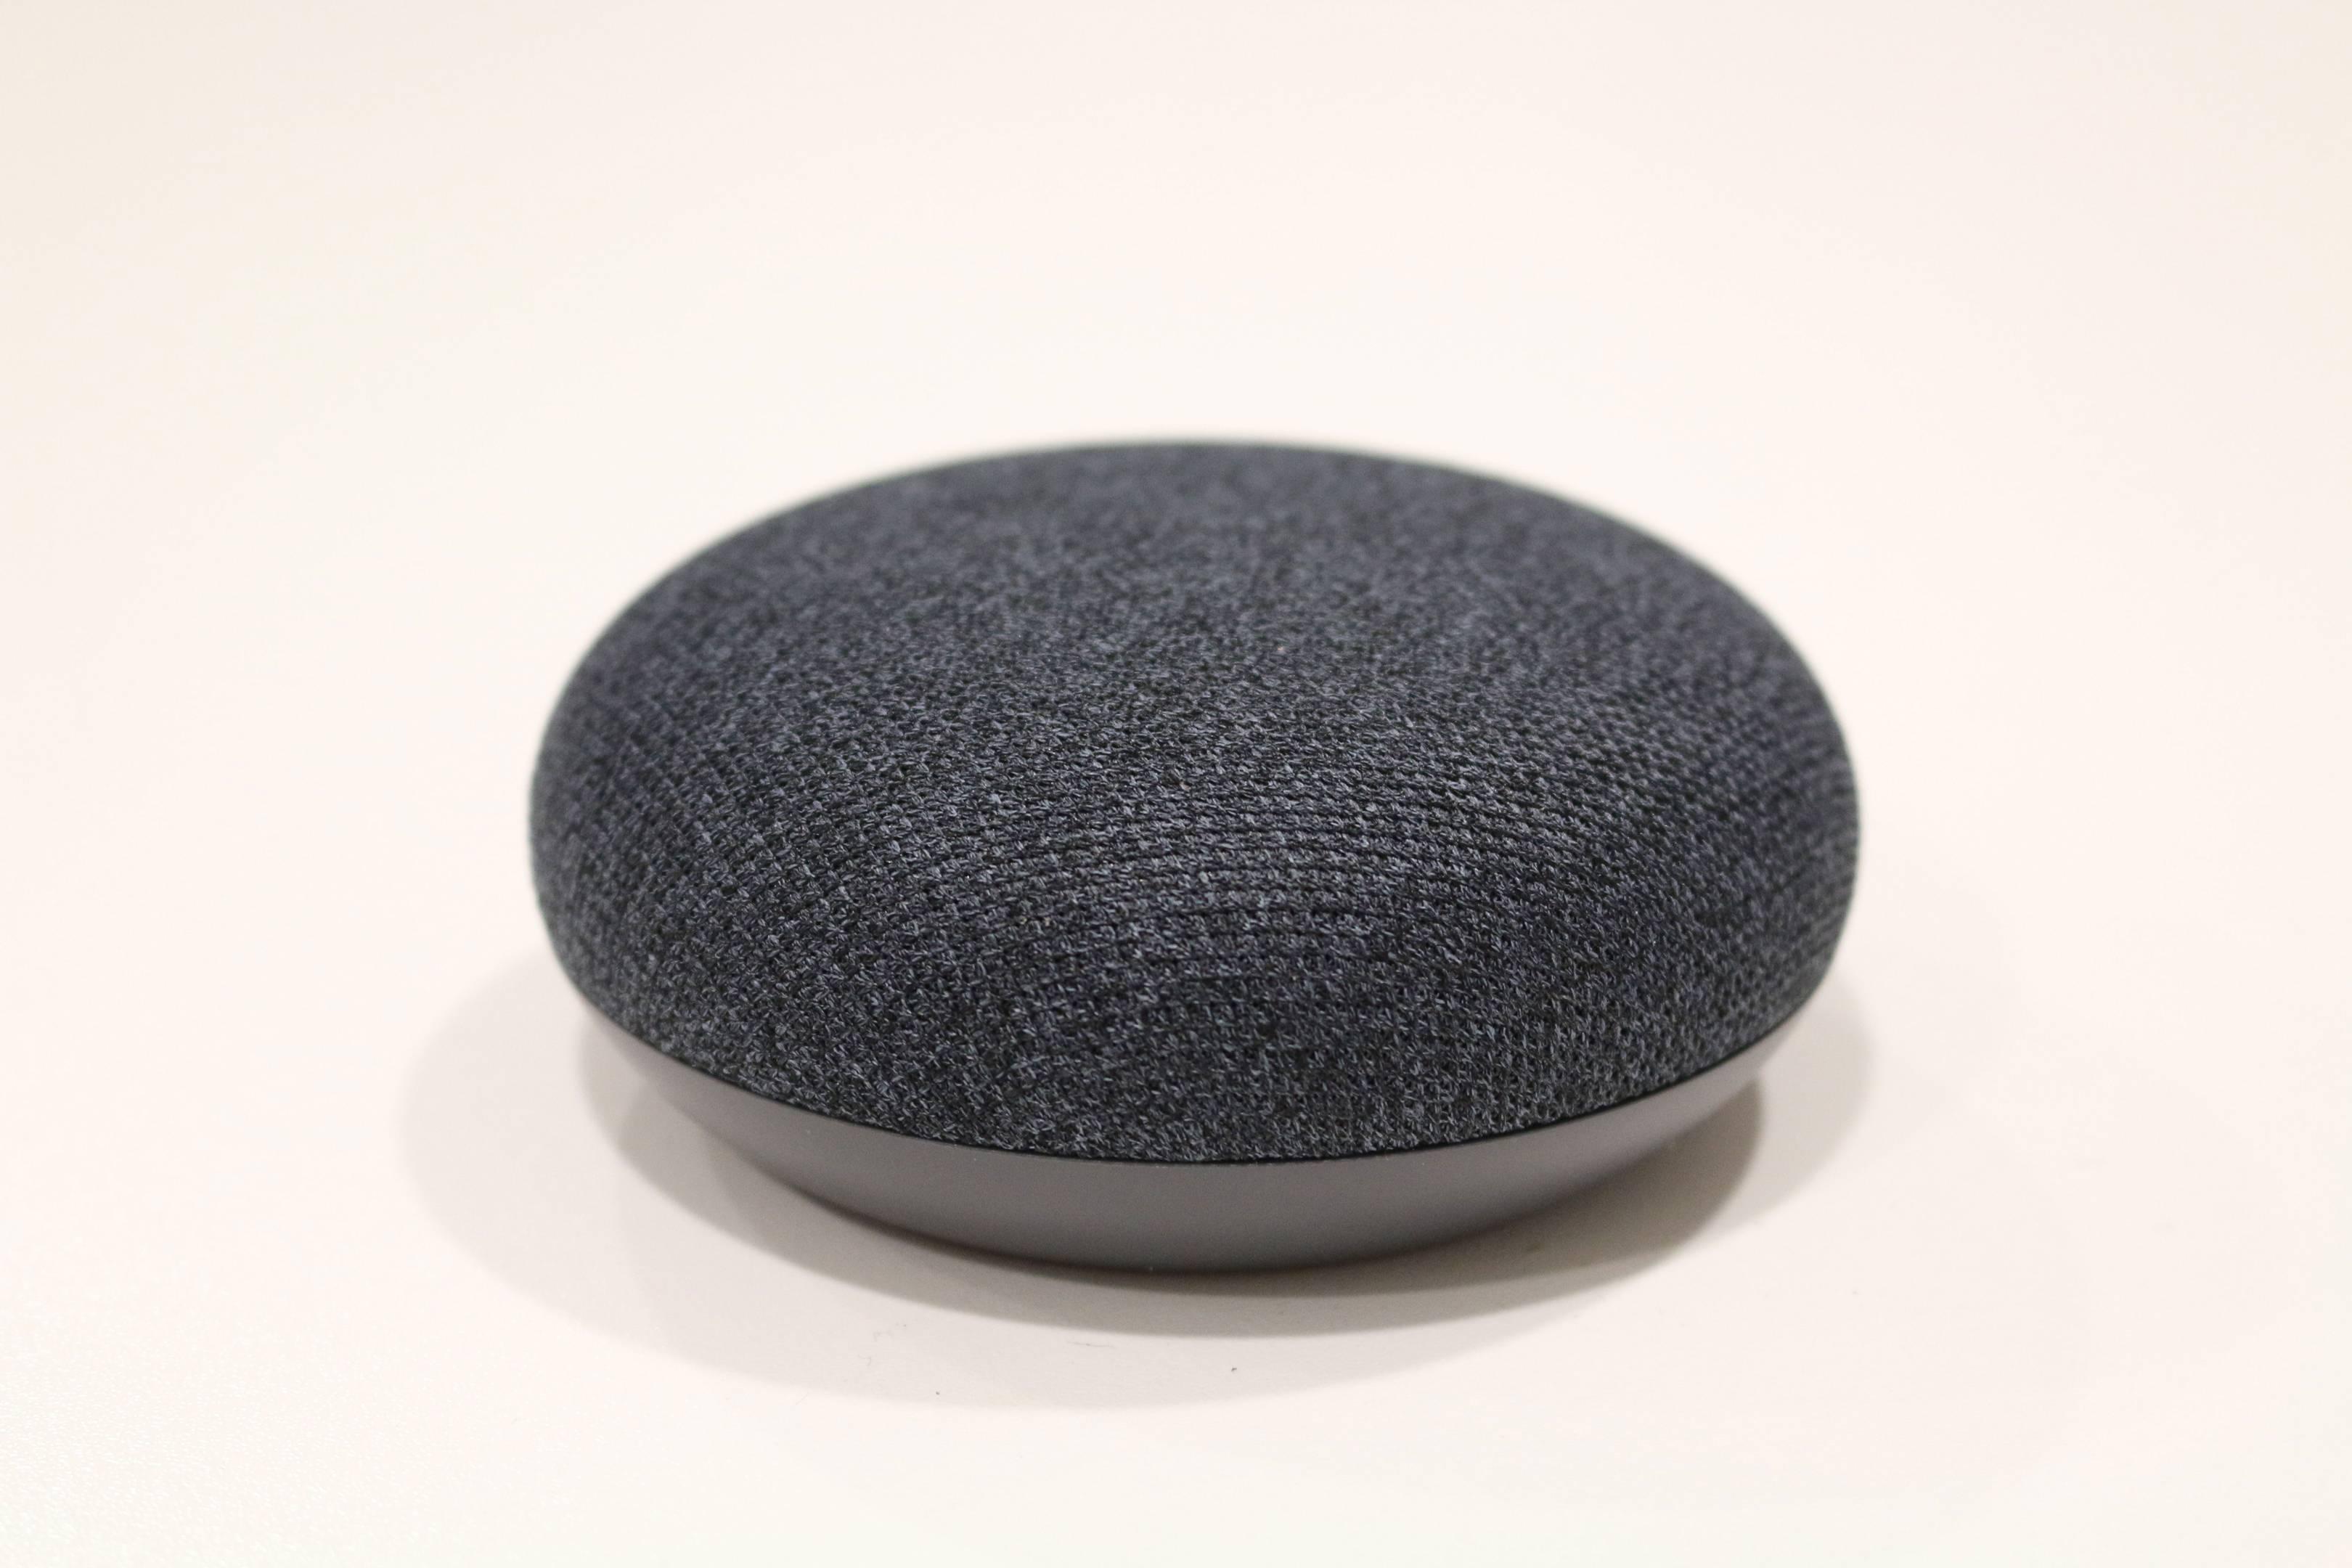 google home mini speaker review audio quality